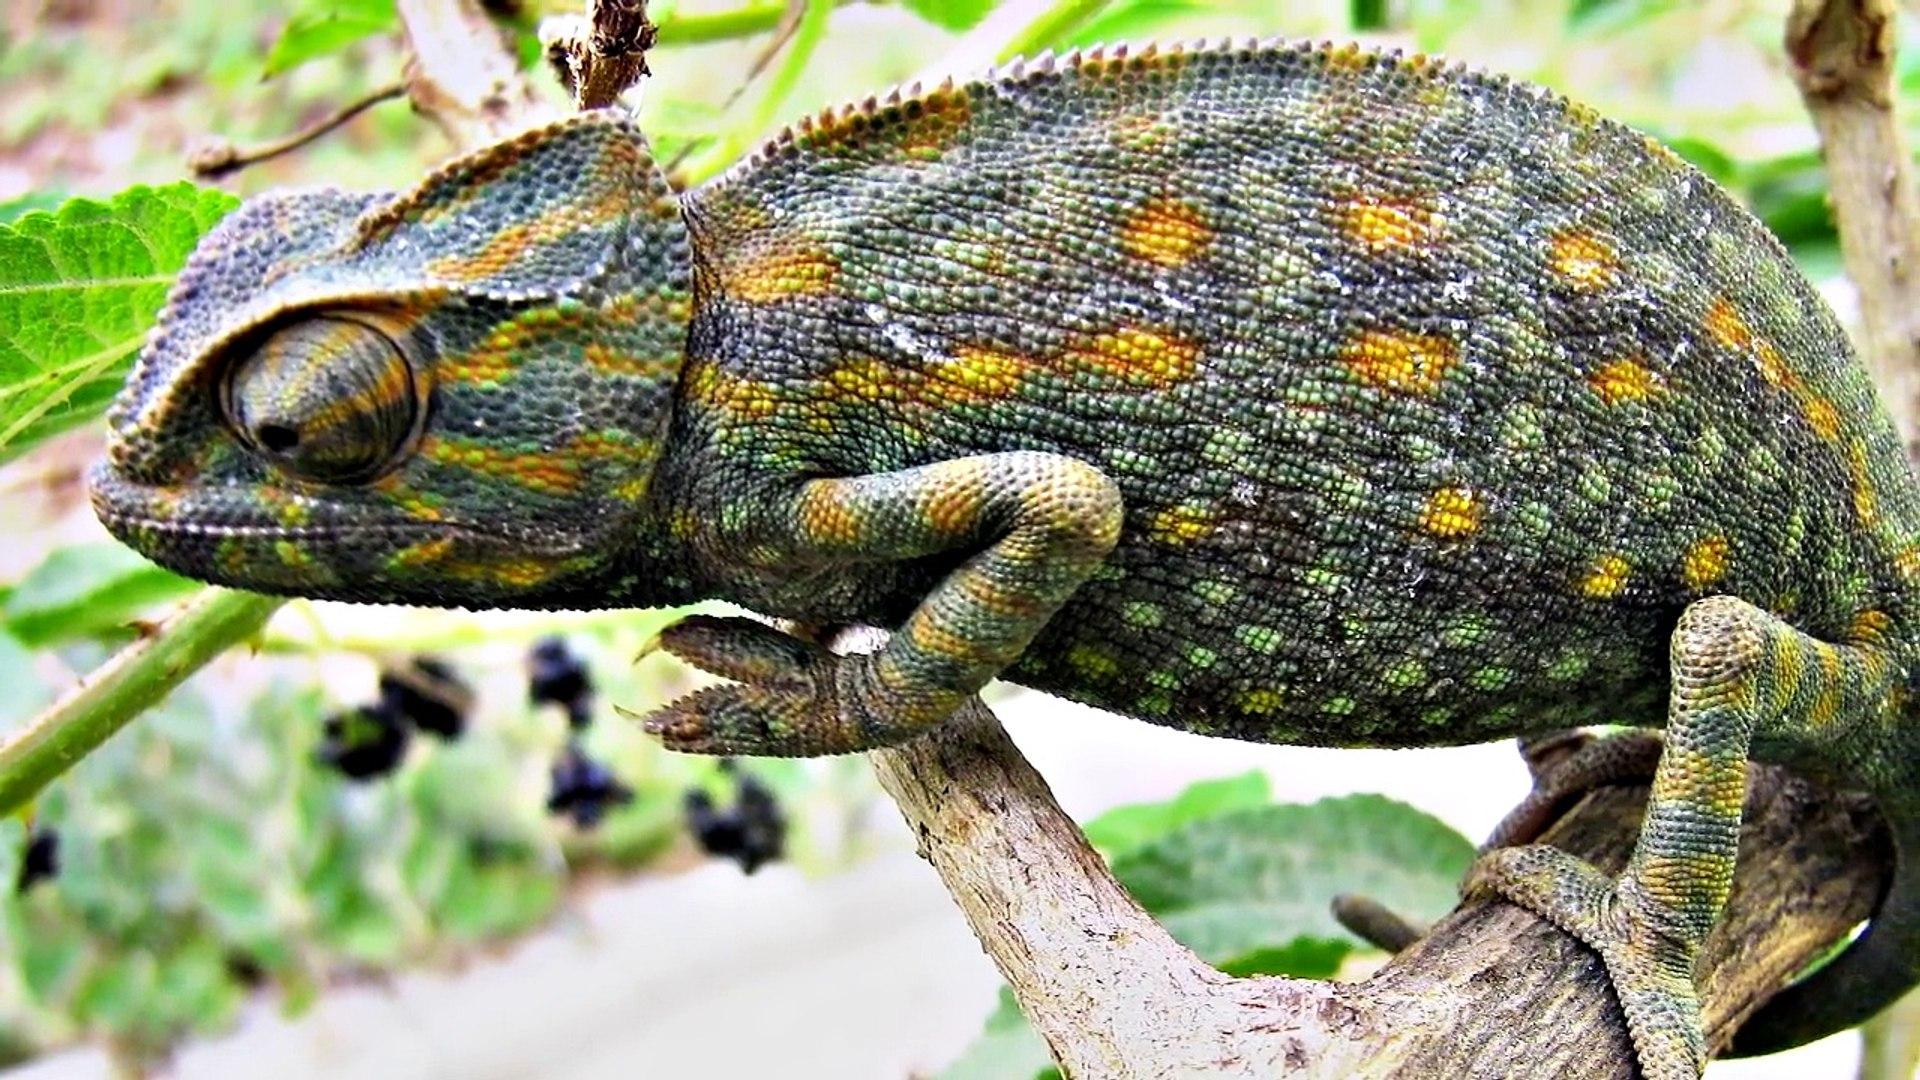 5 Animales Con Camuflajes Sorprendentes